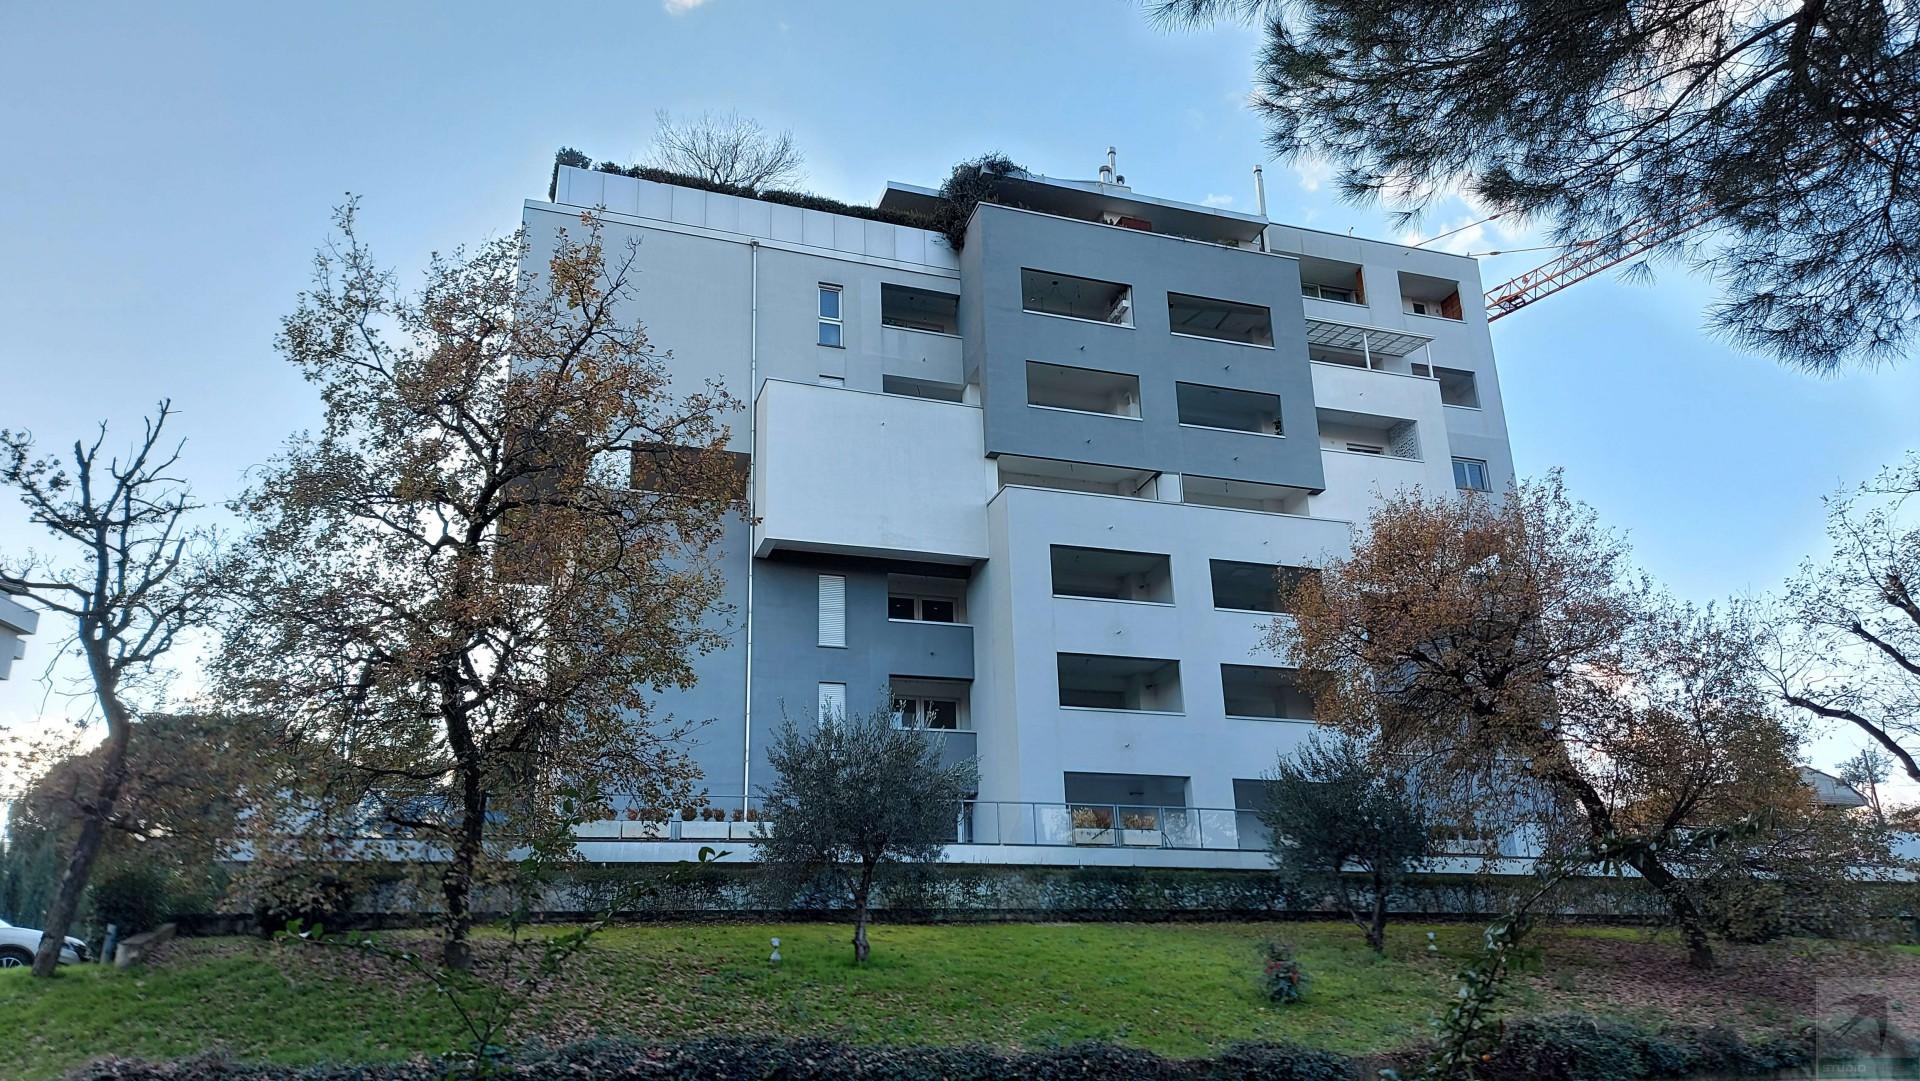 Appartamento in Vendita 222,00 mq - N. camere: 4 - - Rende - Roges-Commenda (CS)